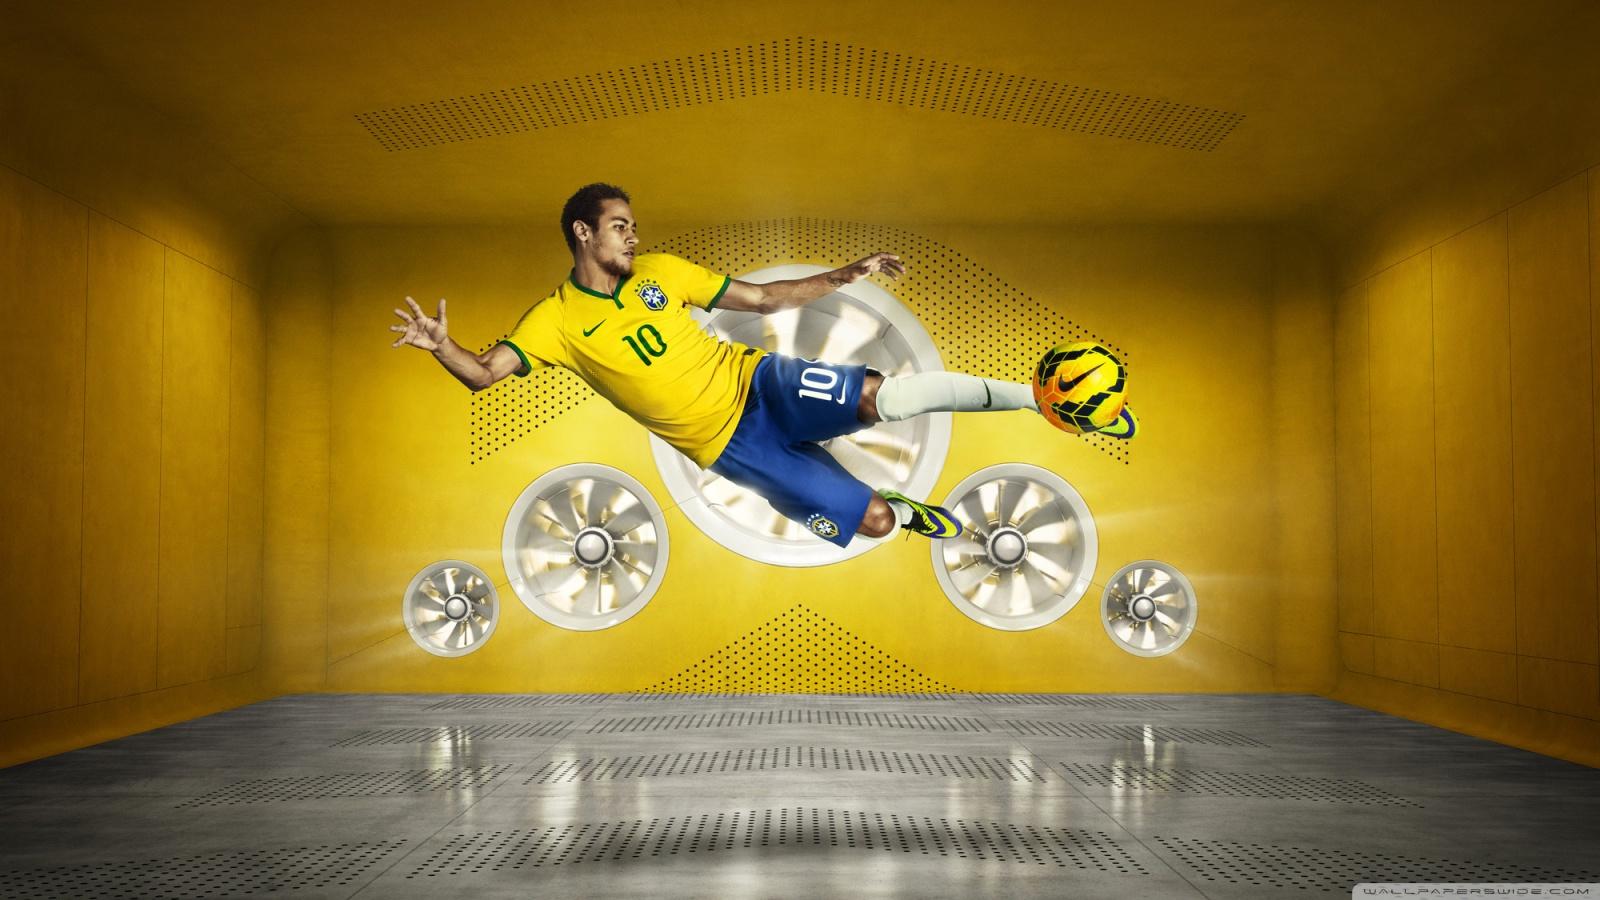 neymar_2014-wallpaper-1600x900.jpg